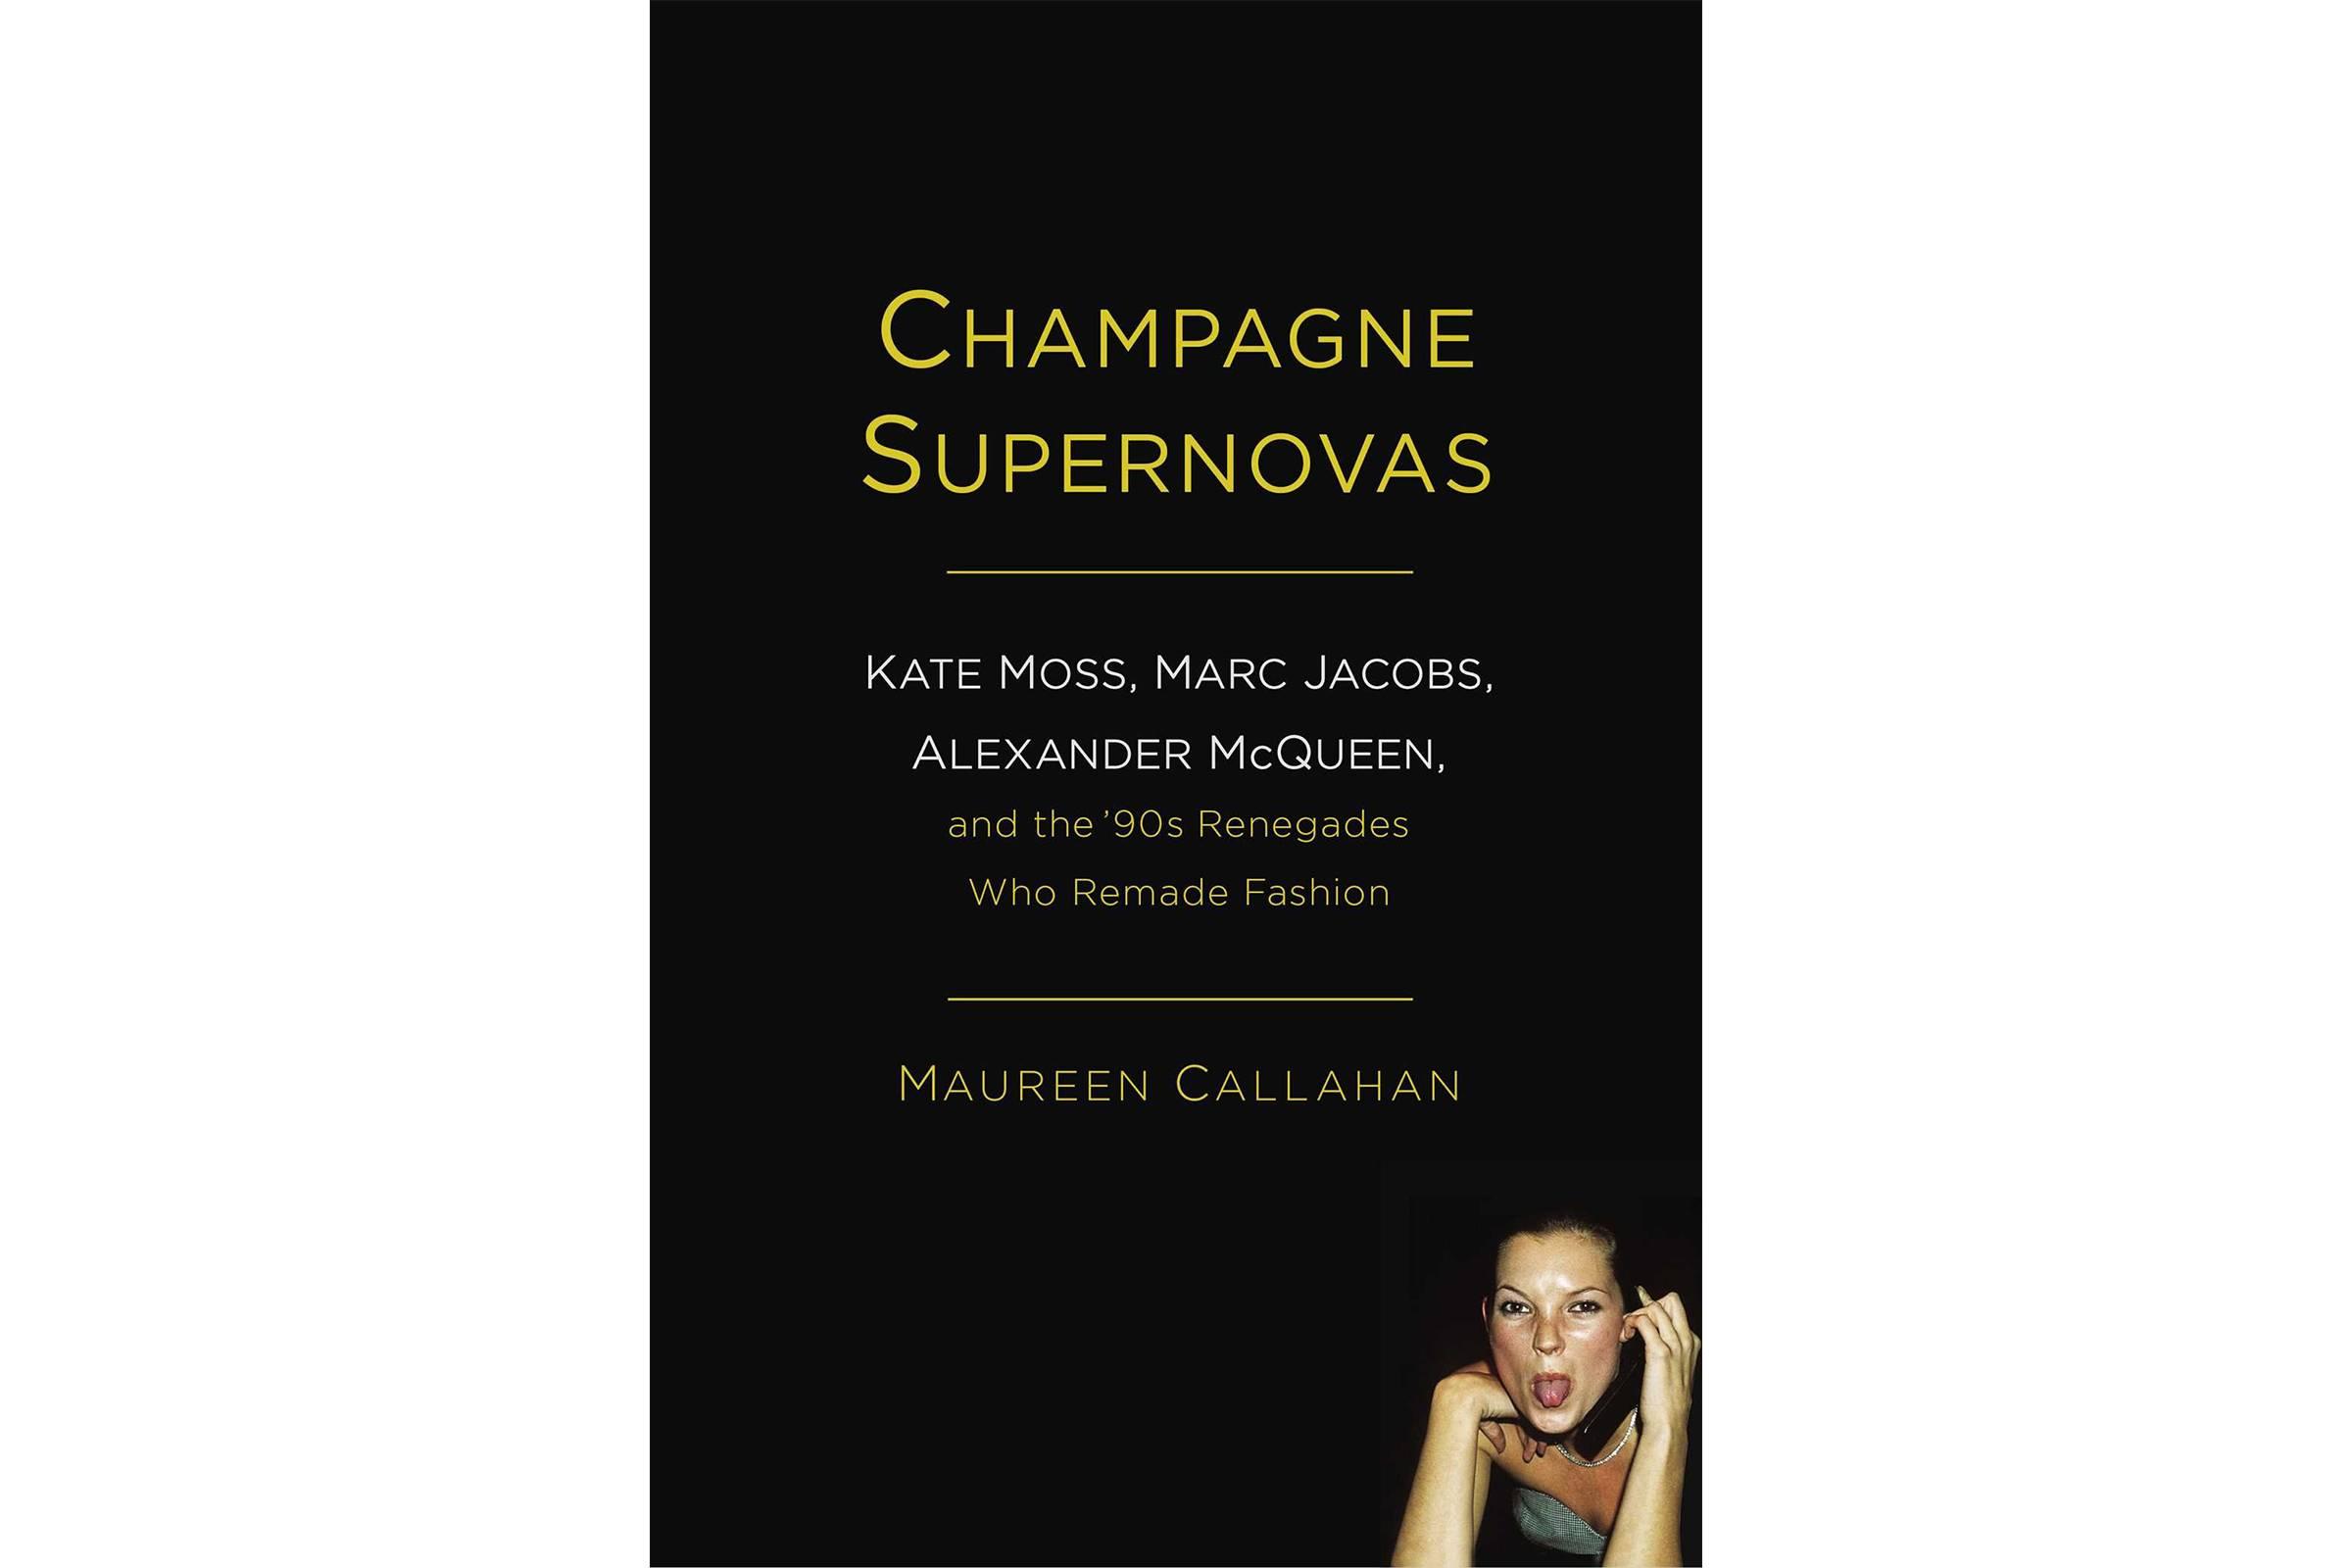 Champagne Supernovas by Maureen Callahan